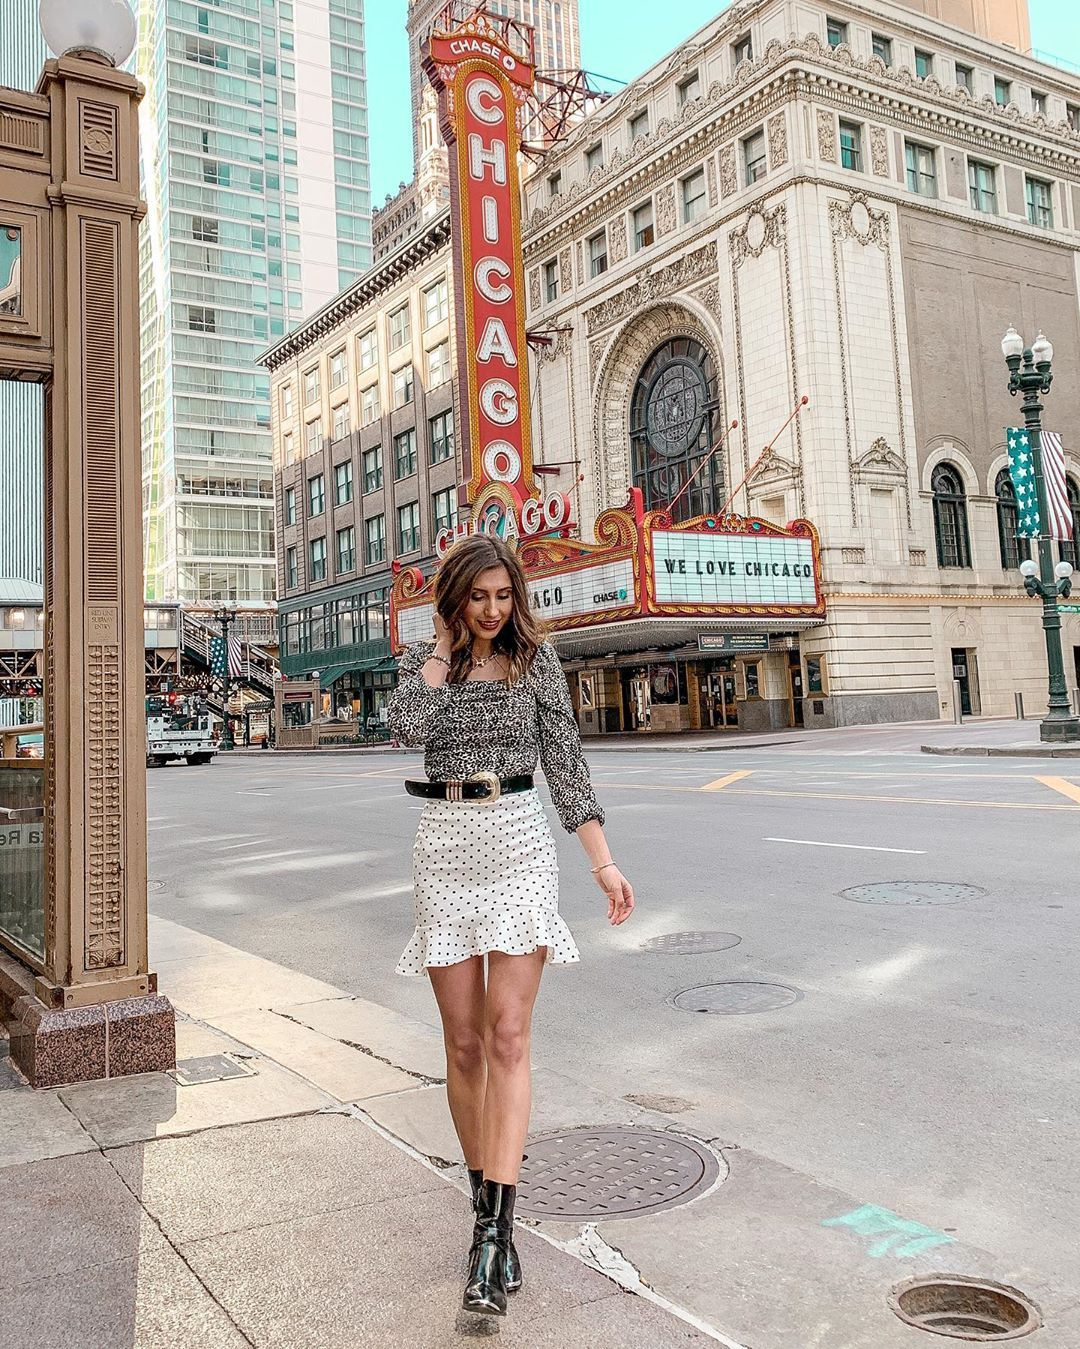 "Ana Burduja on Instagram: ""The Chicago Theatre heart of downtown Chicago. 💗 . . . . #chicagotheatre #chicago #adventure #springoutfits #chicagodowntown #travelchicago…"""